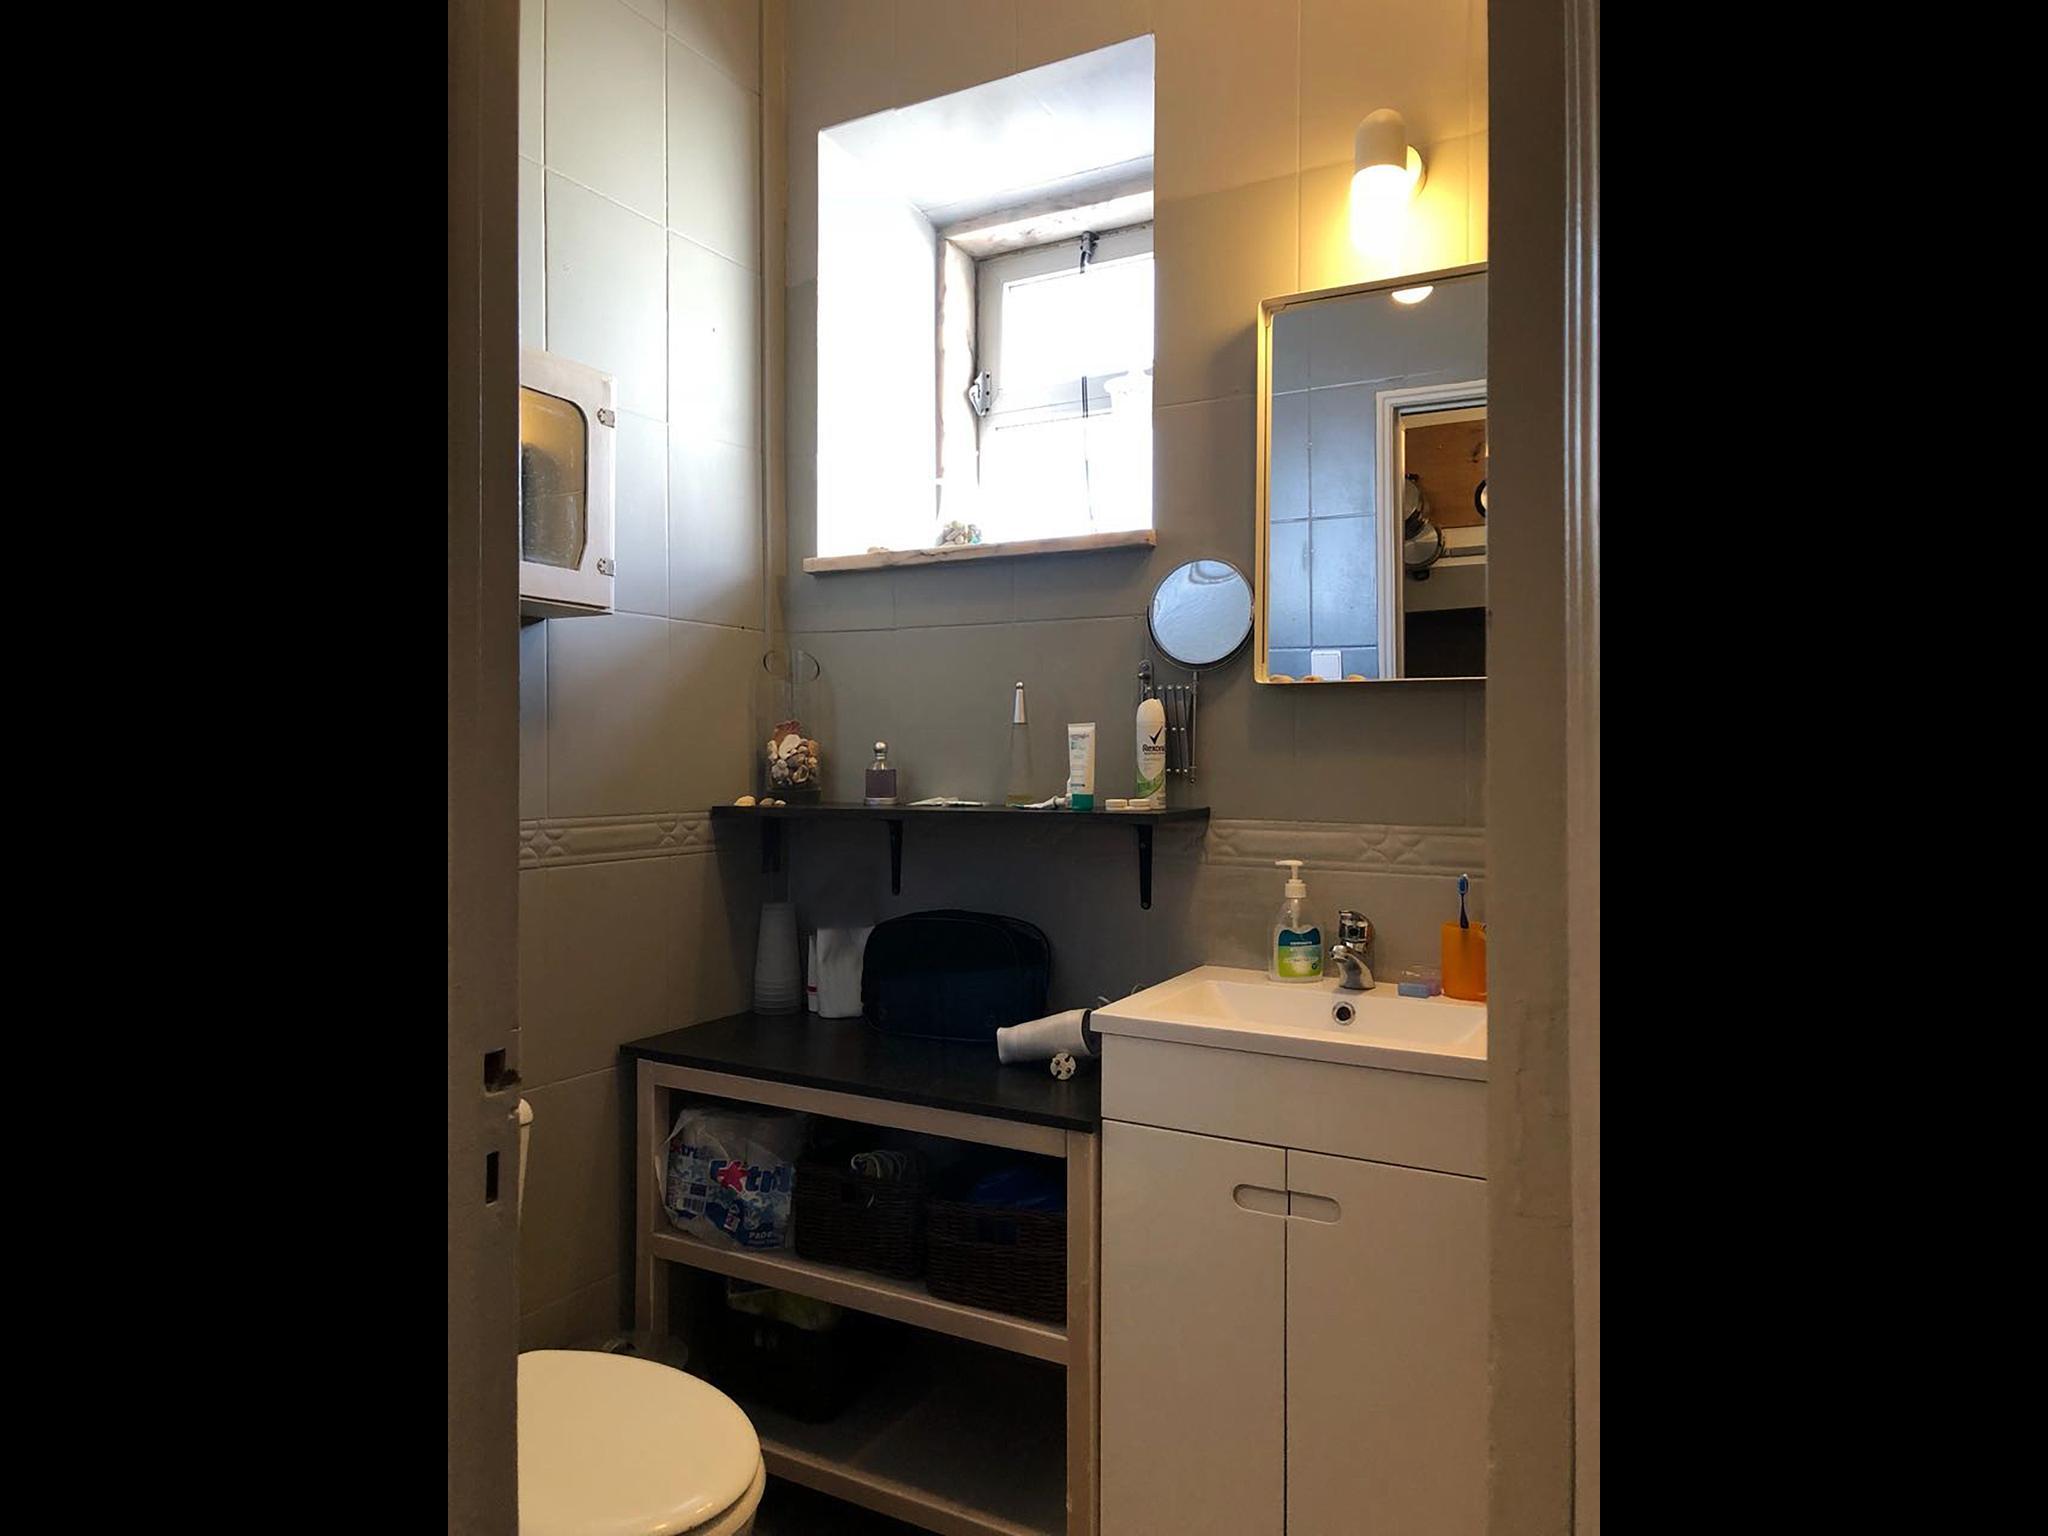 Loureiro - 2 bedroom flat in Lisbon